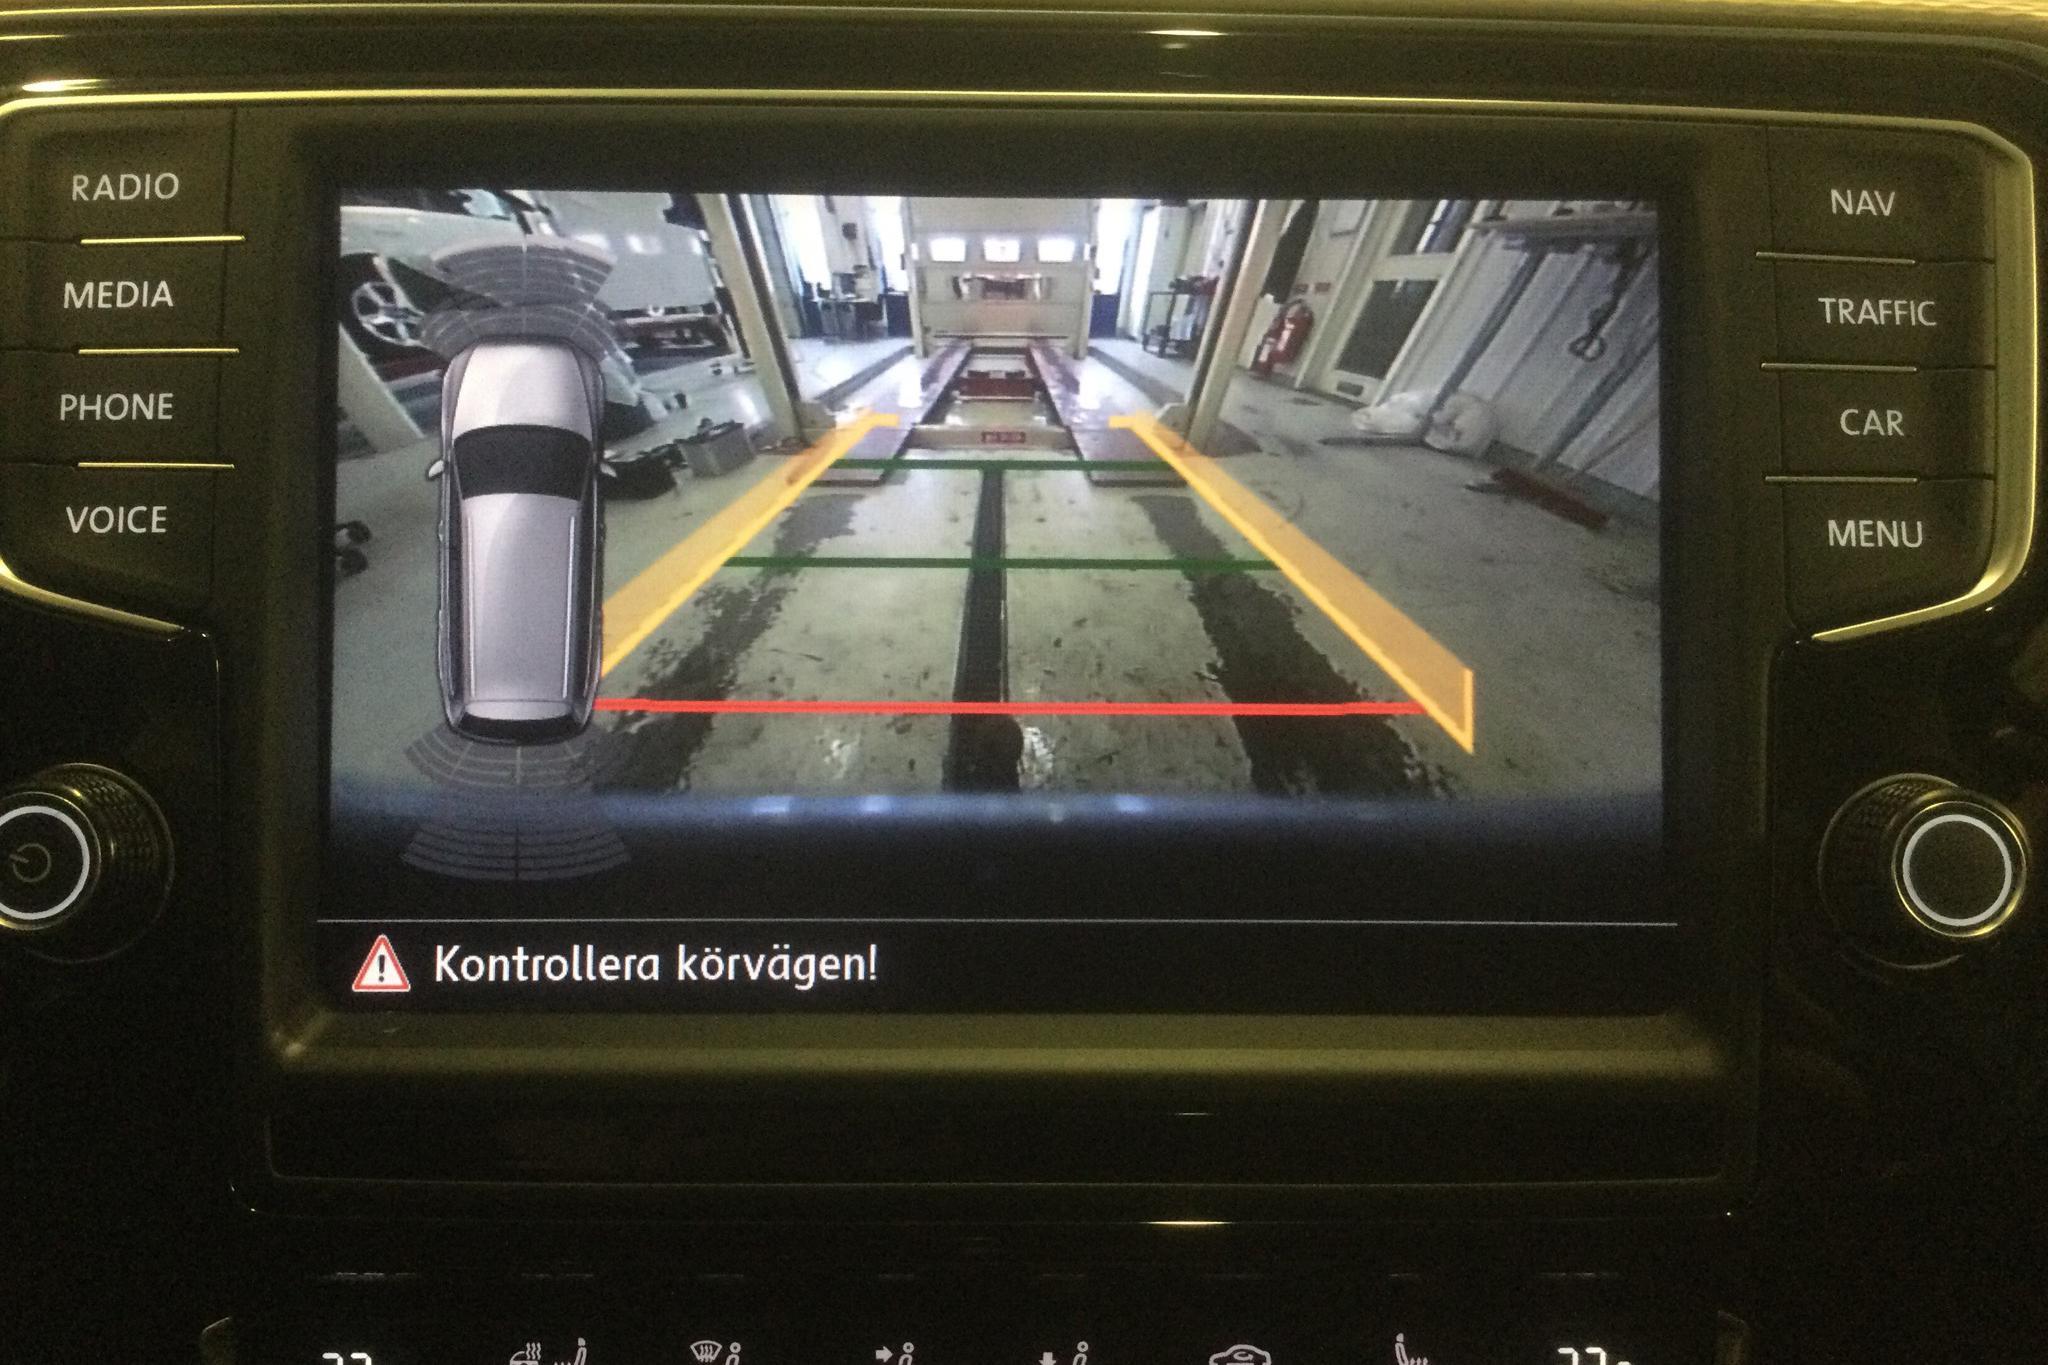 VW Passat Alltrack 2.0 TDI Sportscombi 4MOTION (190hk) - 90 630 km - Automatic - silver - 2016